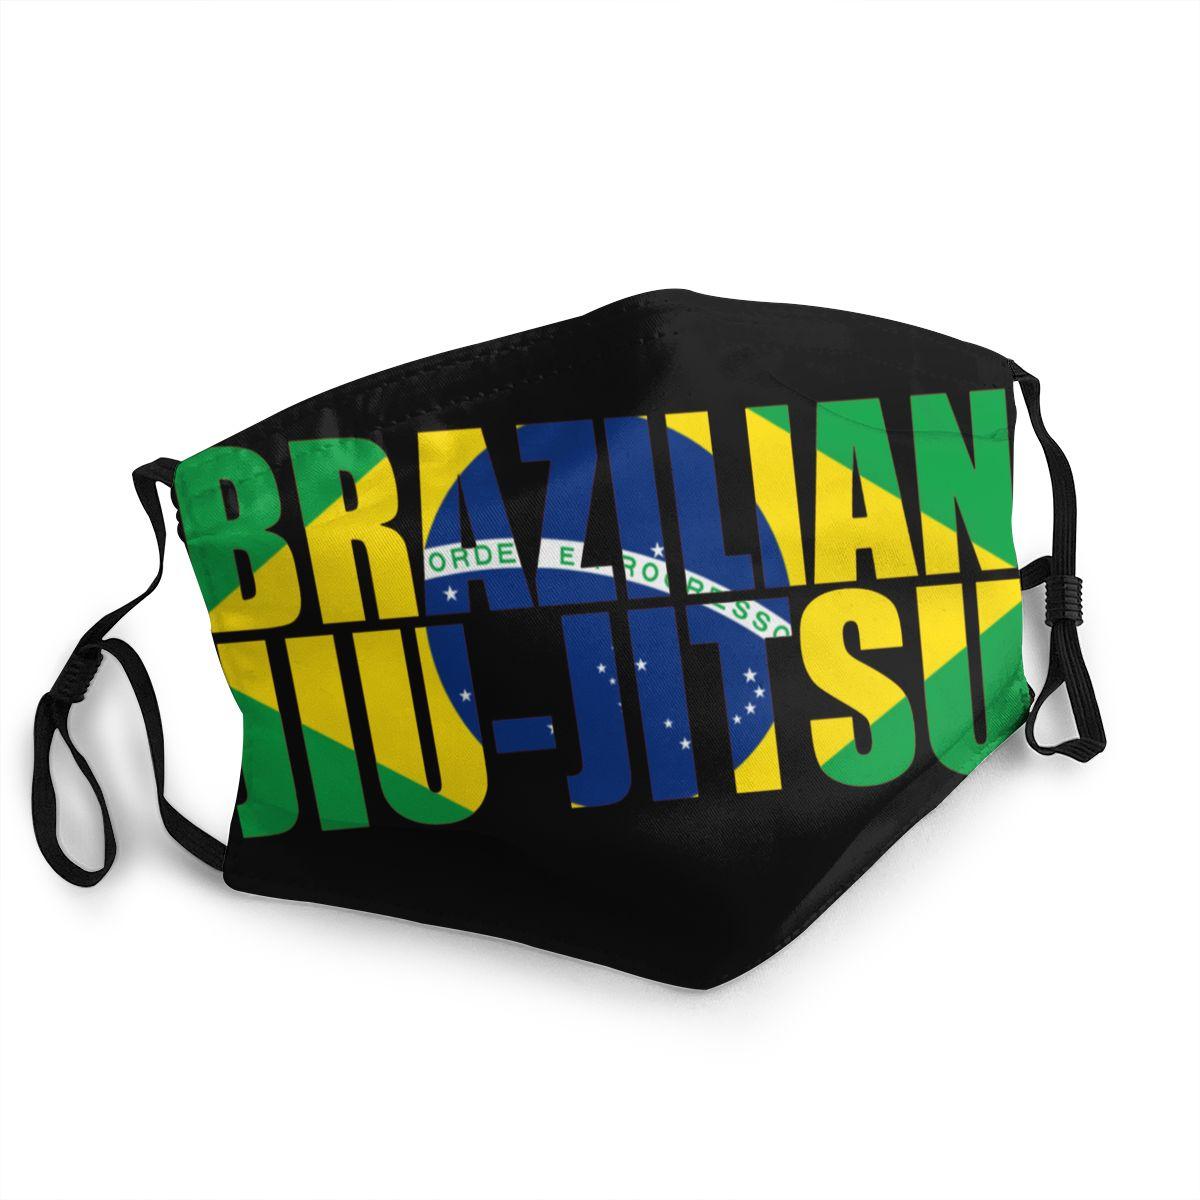 Brazilian Jiu Jitsu BJJ Brazil Flag Art Non-Disposable Face Mask Anti Bacterial Dust Mask Protection Respirator Mouth Muffle